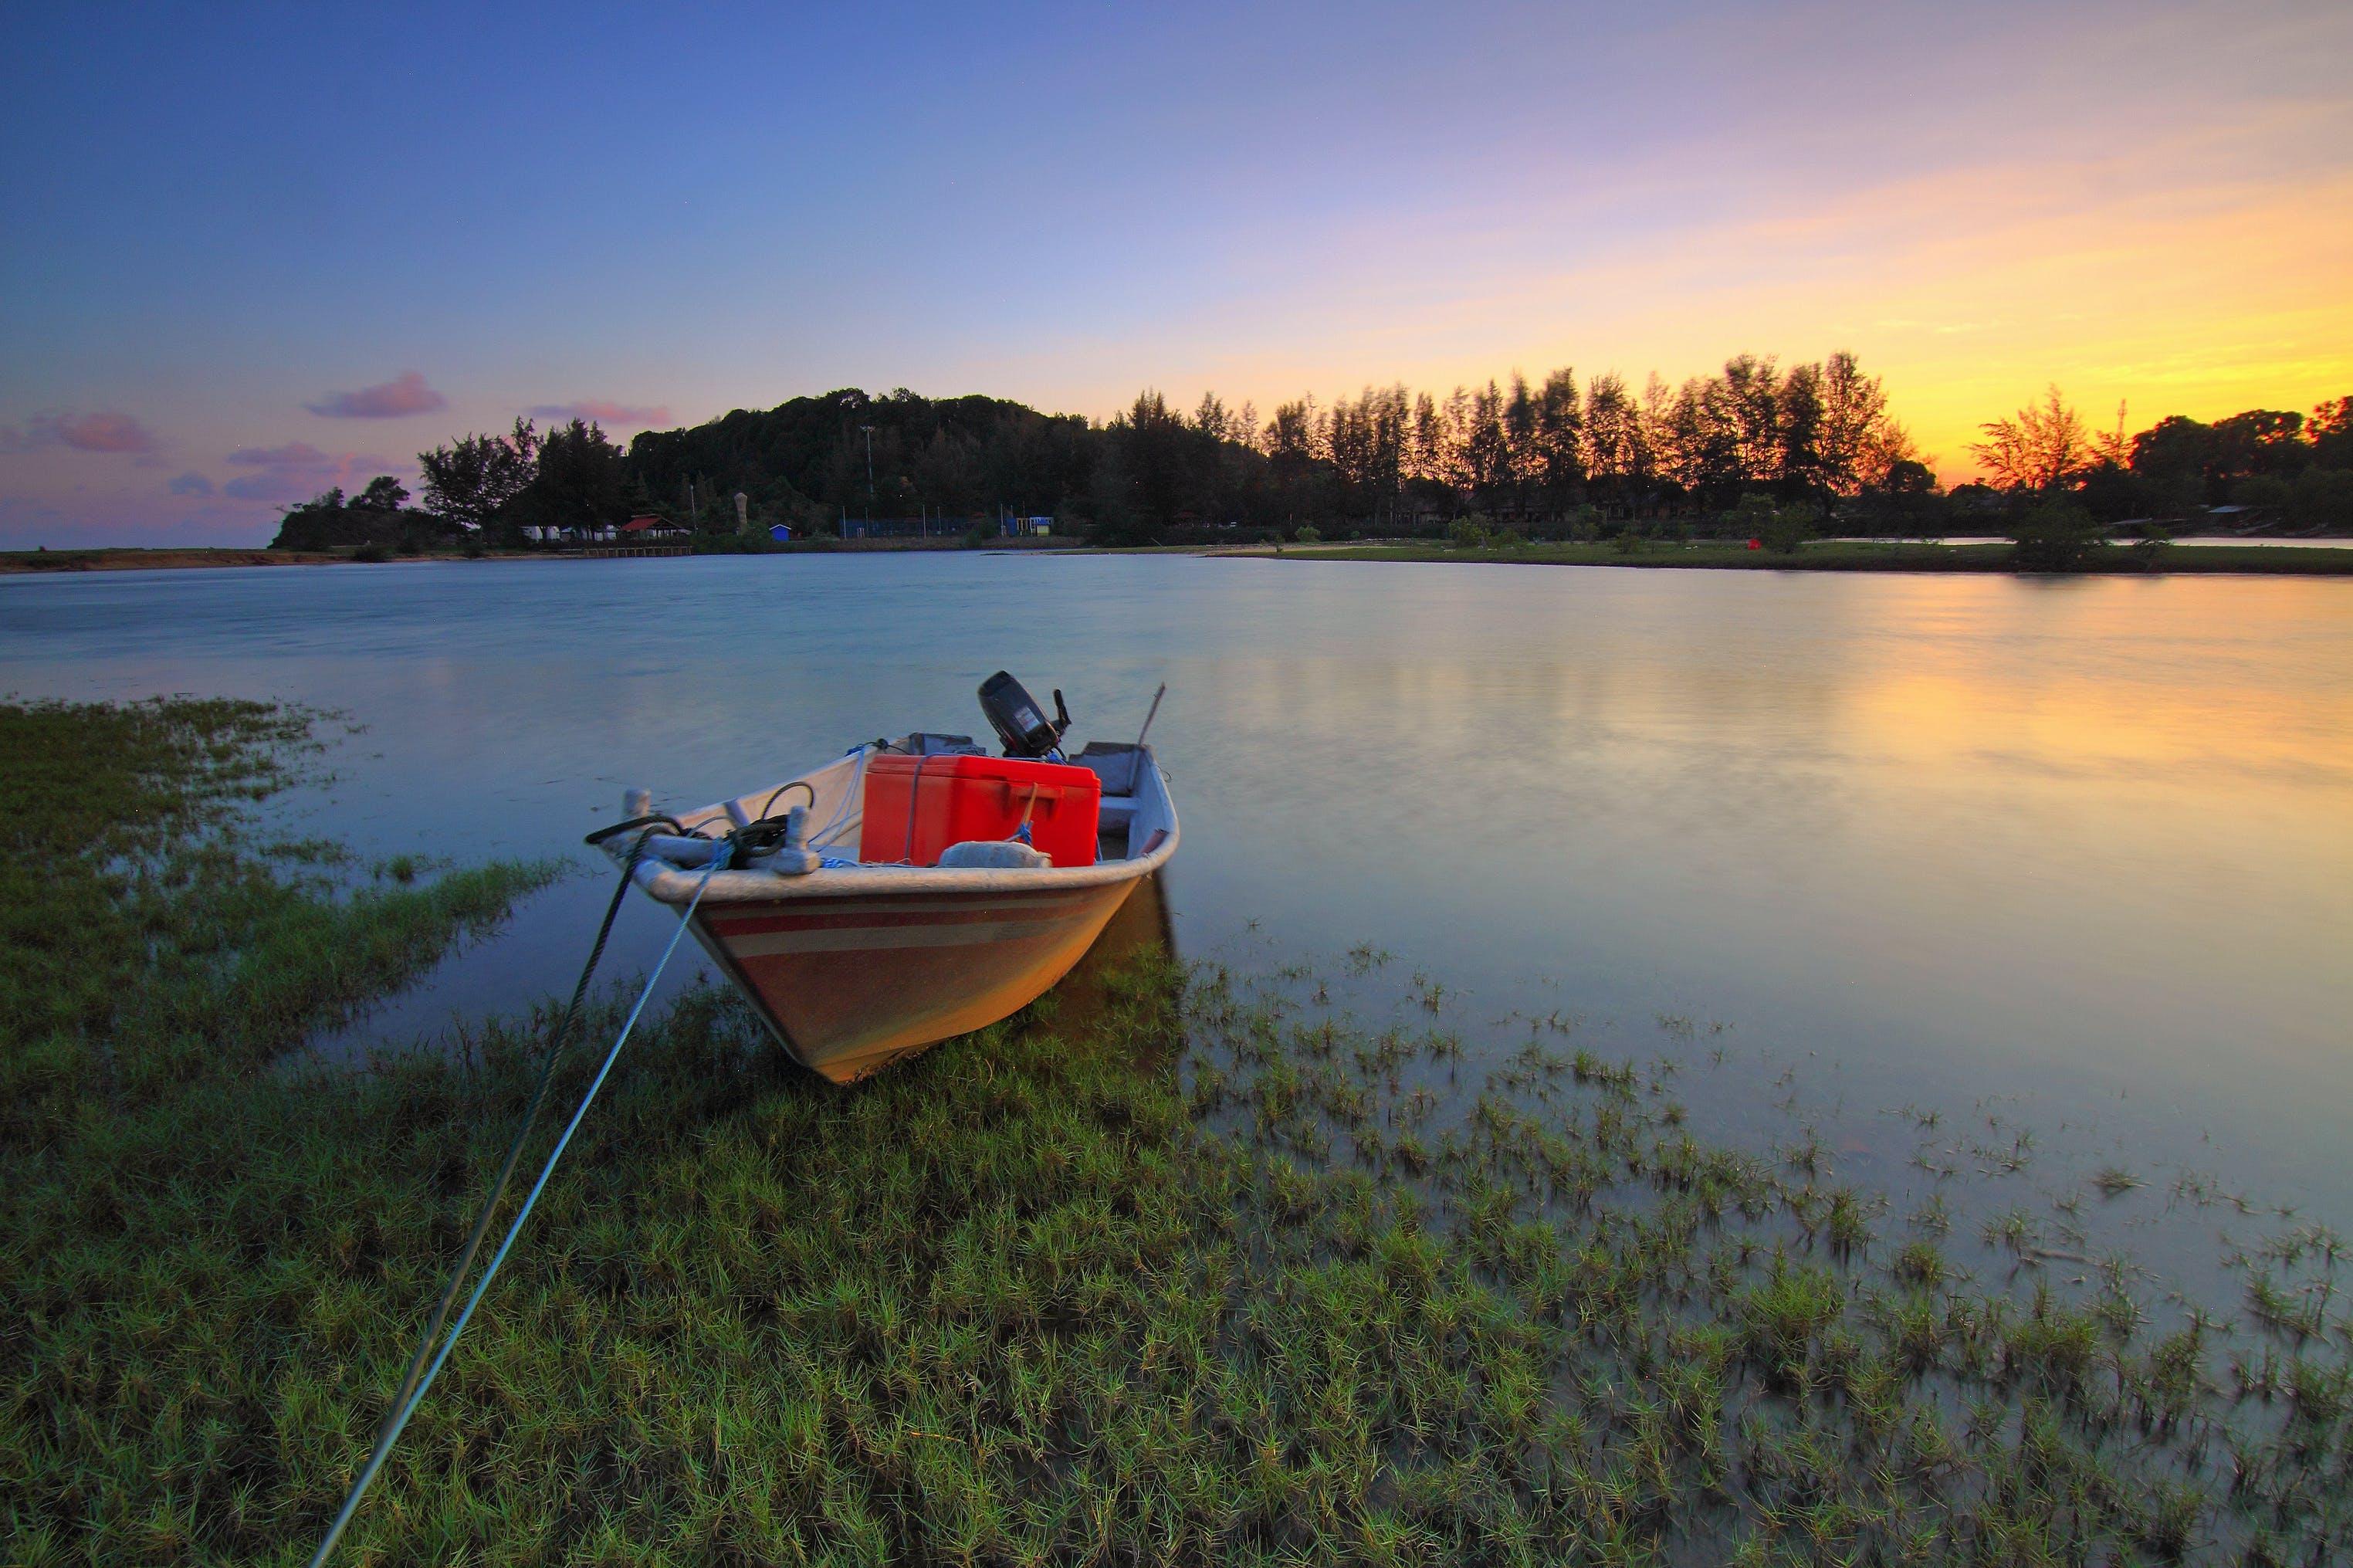 boat, calm waters, canoe